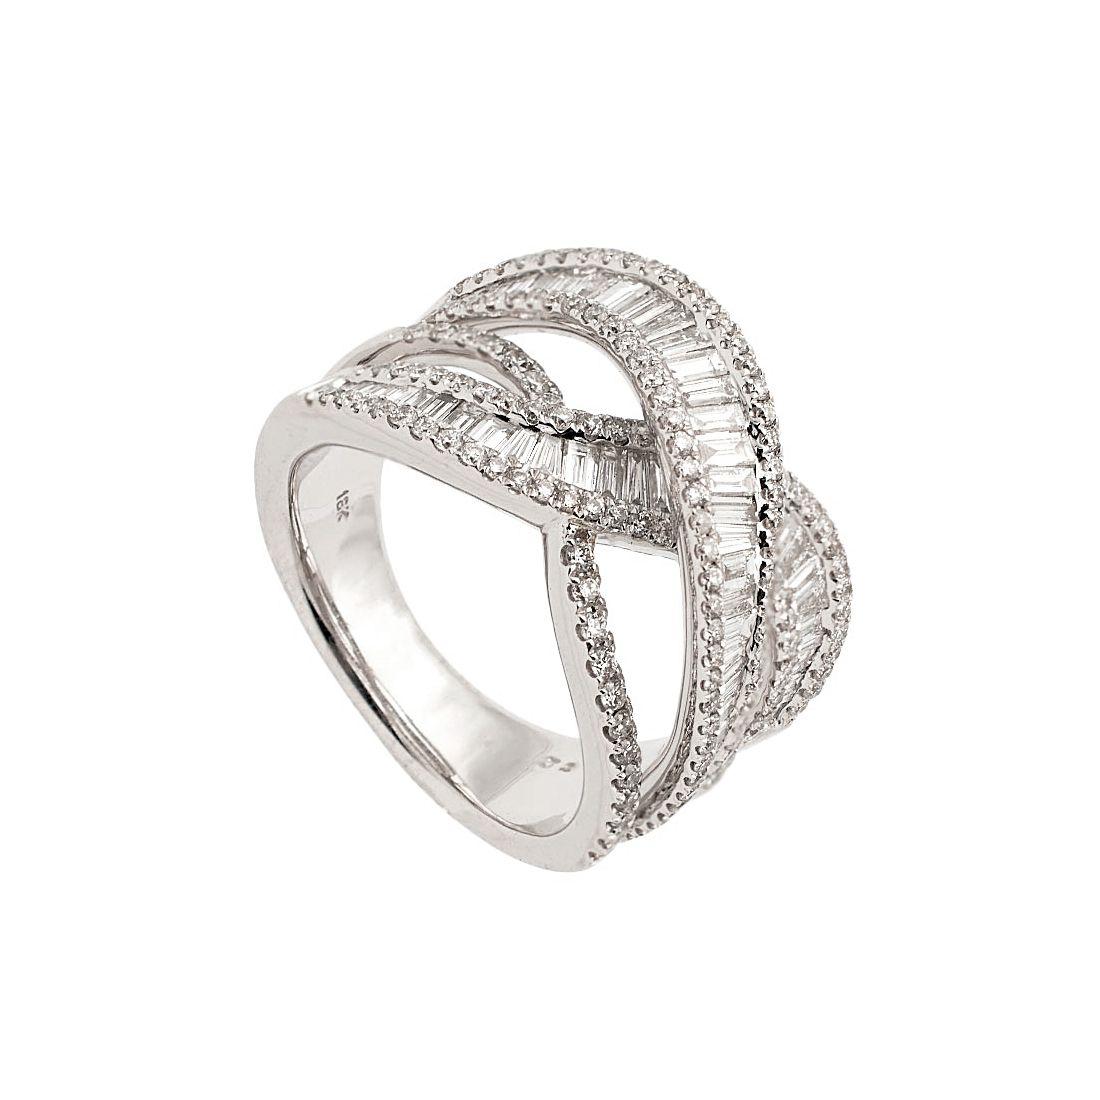 Sortija de oro blanco con diamantes en tres bandas  - 1